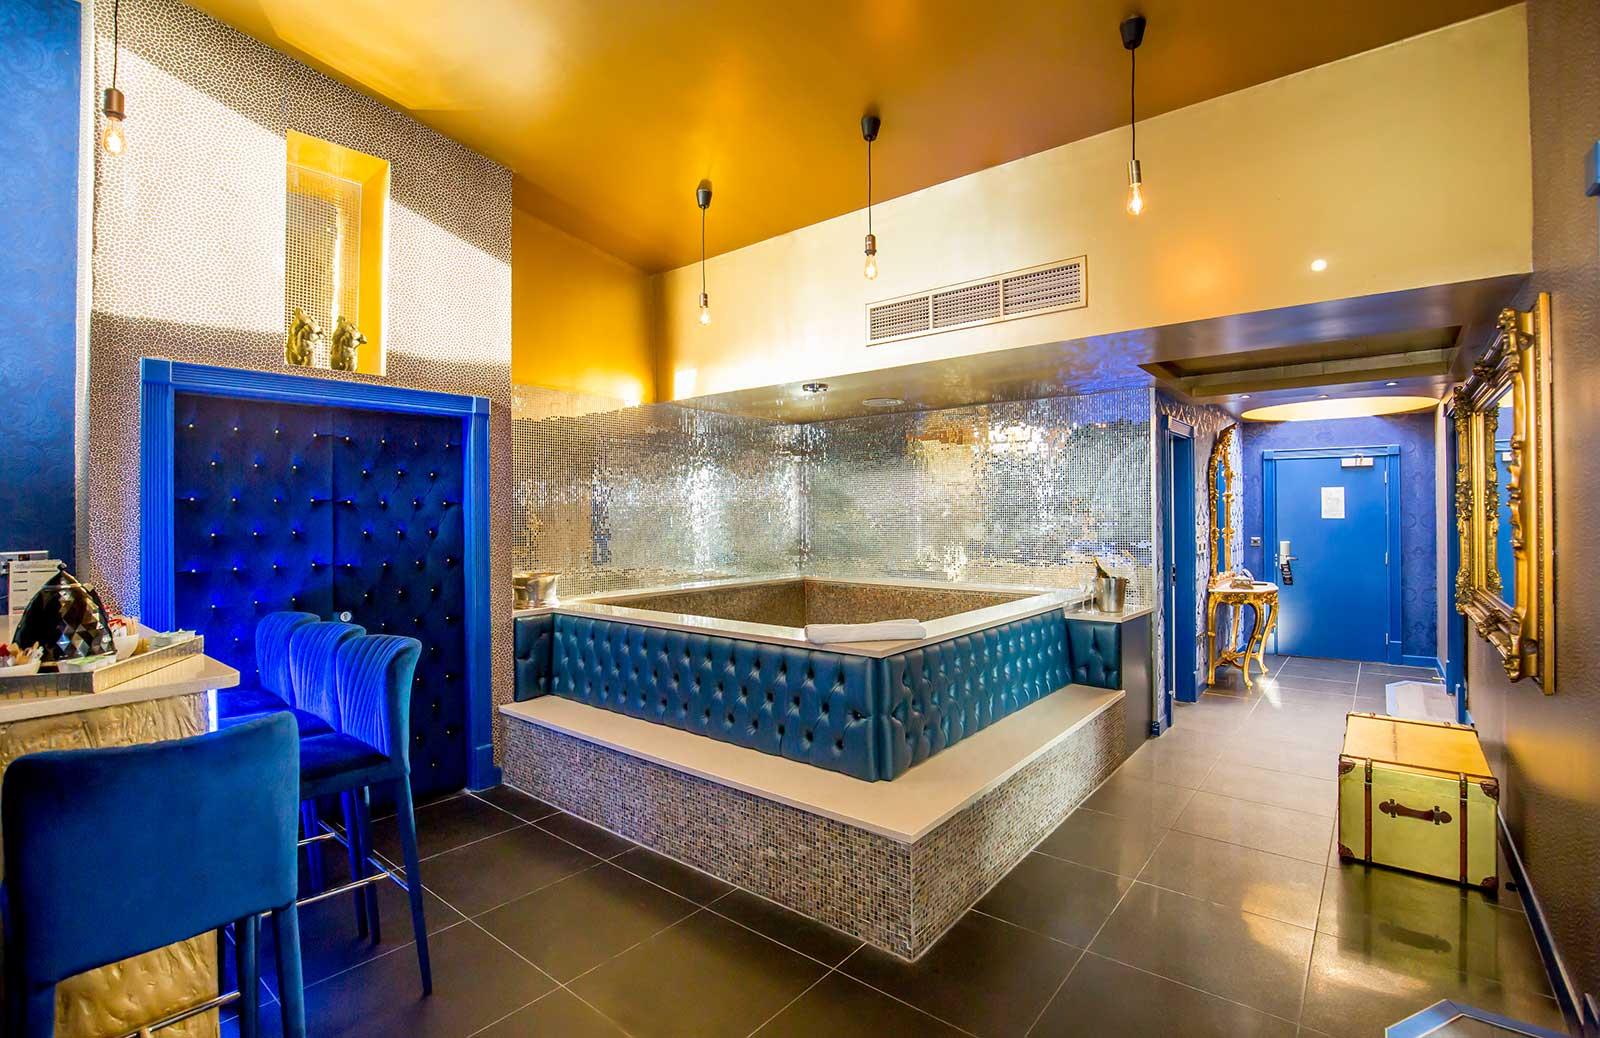 Skyline Liverpool pool party hotel room